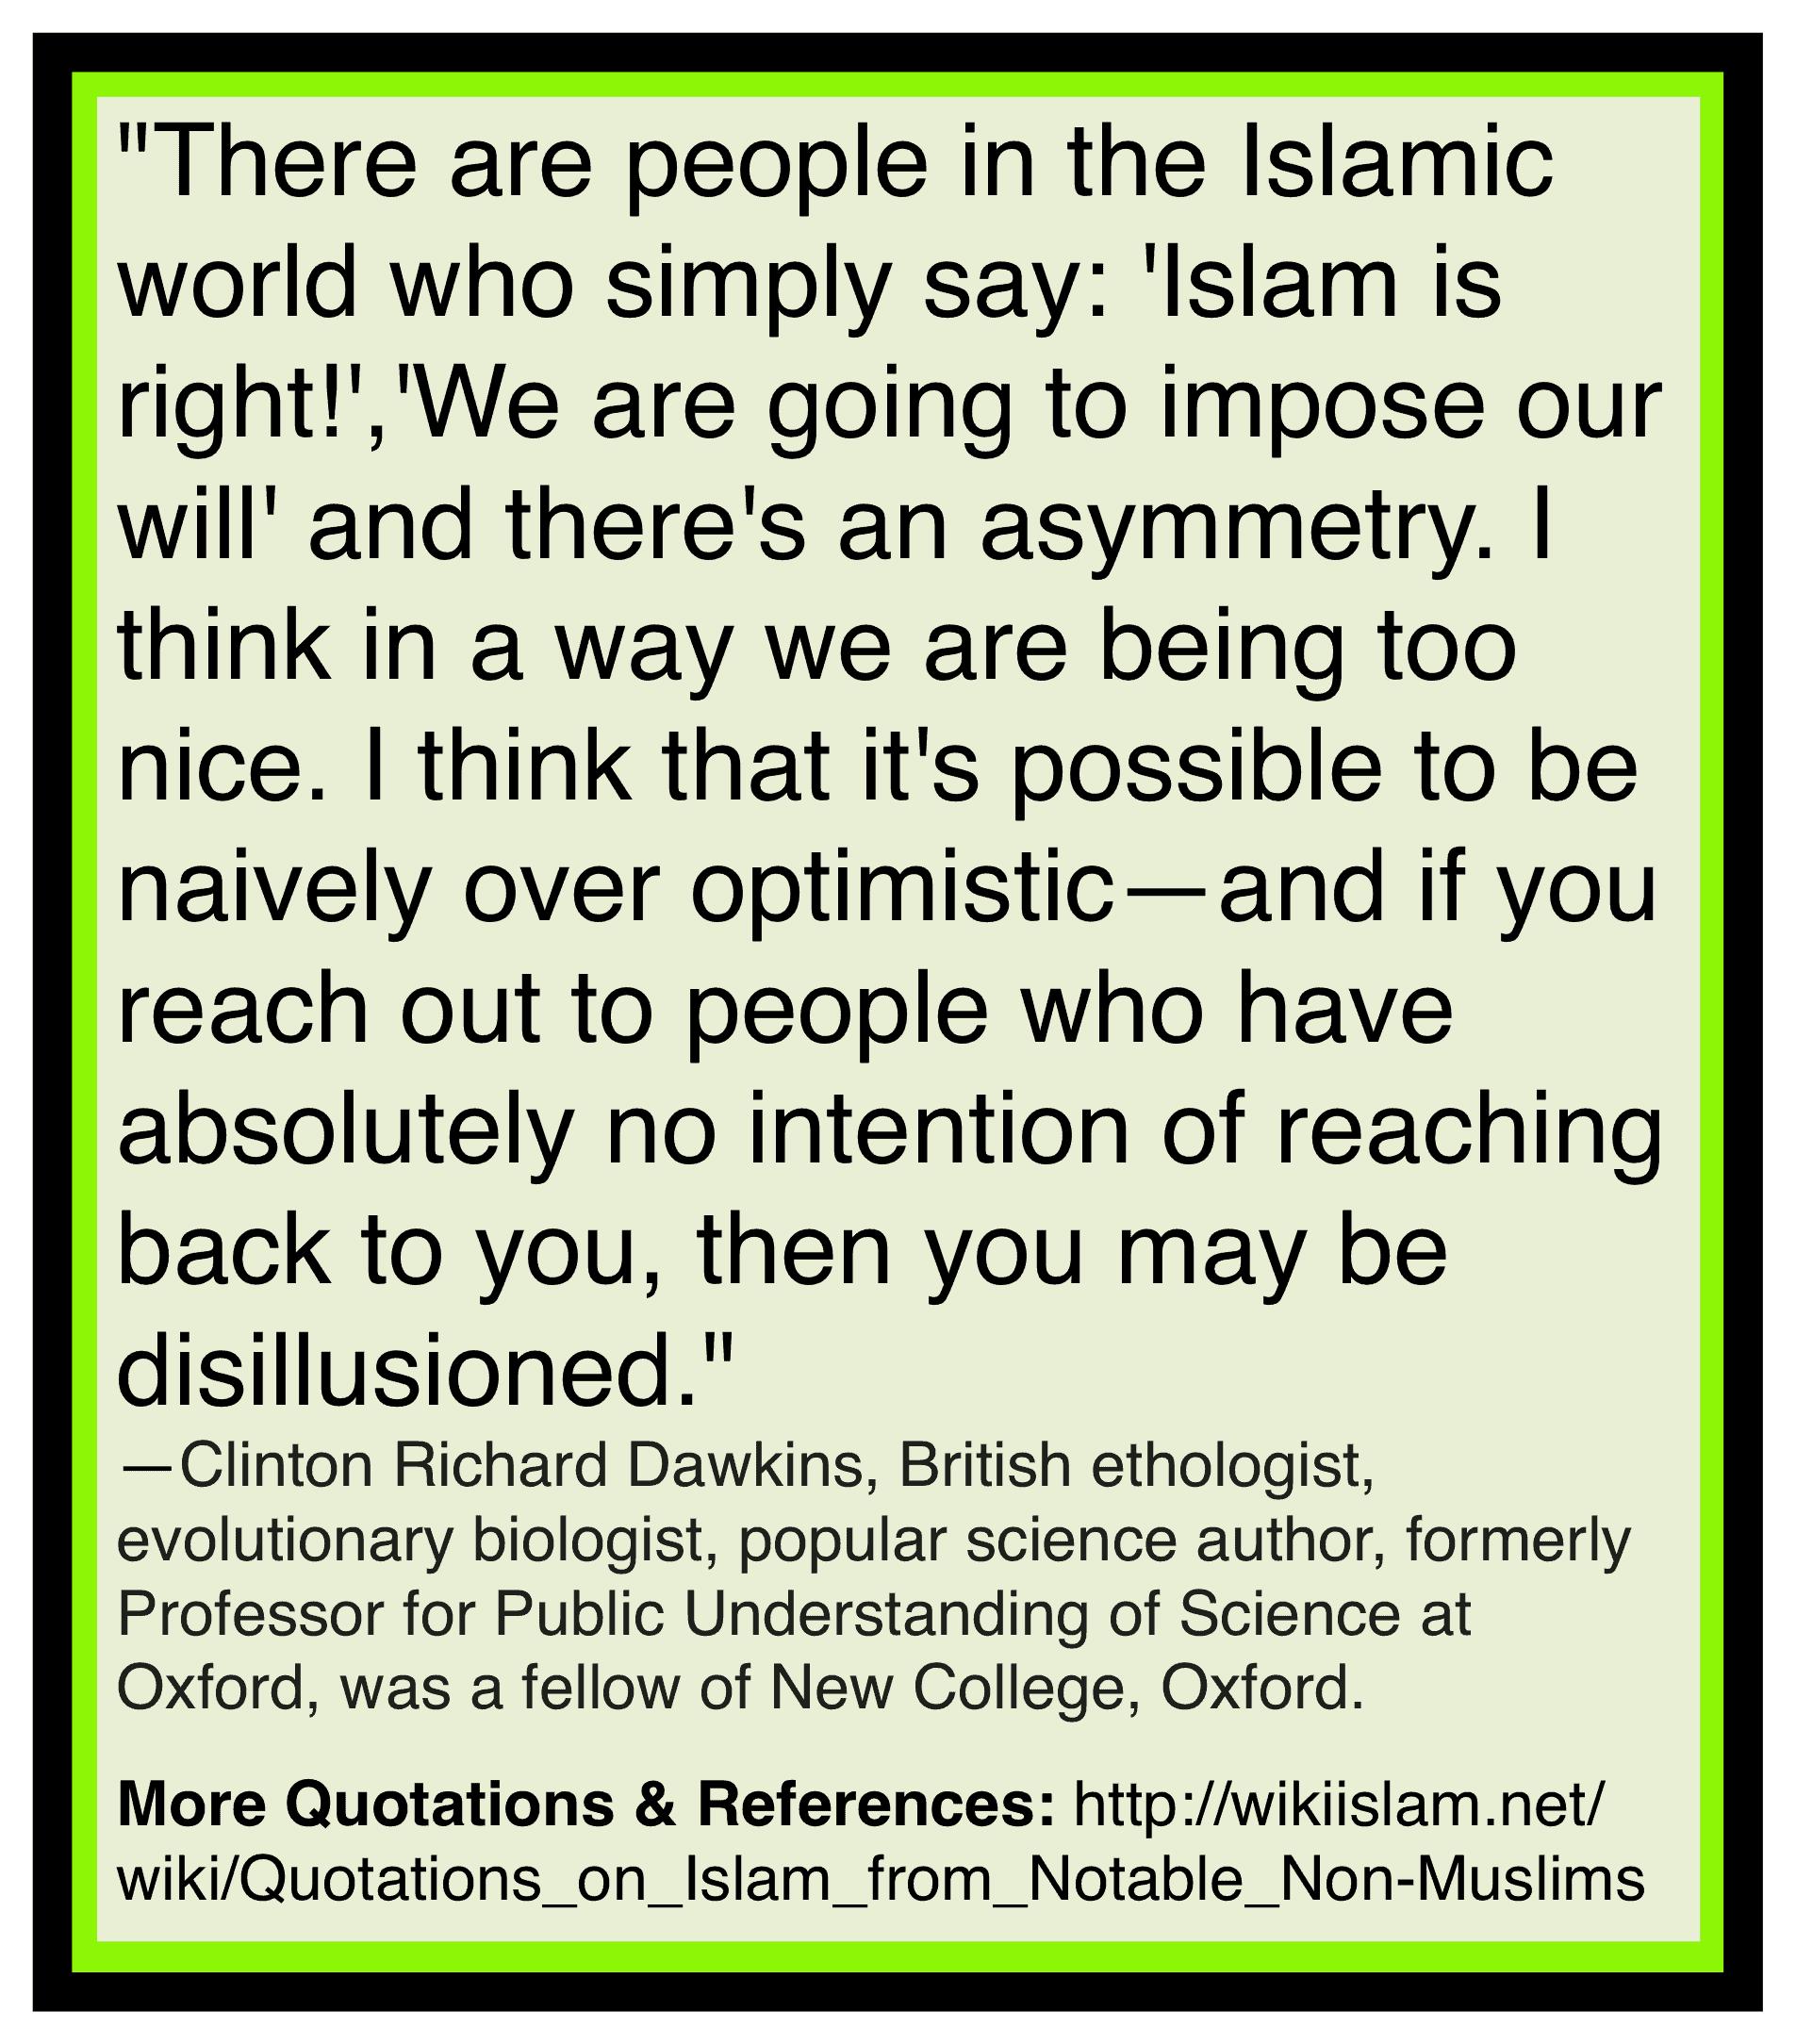 Islam treated too nice